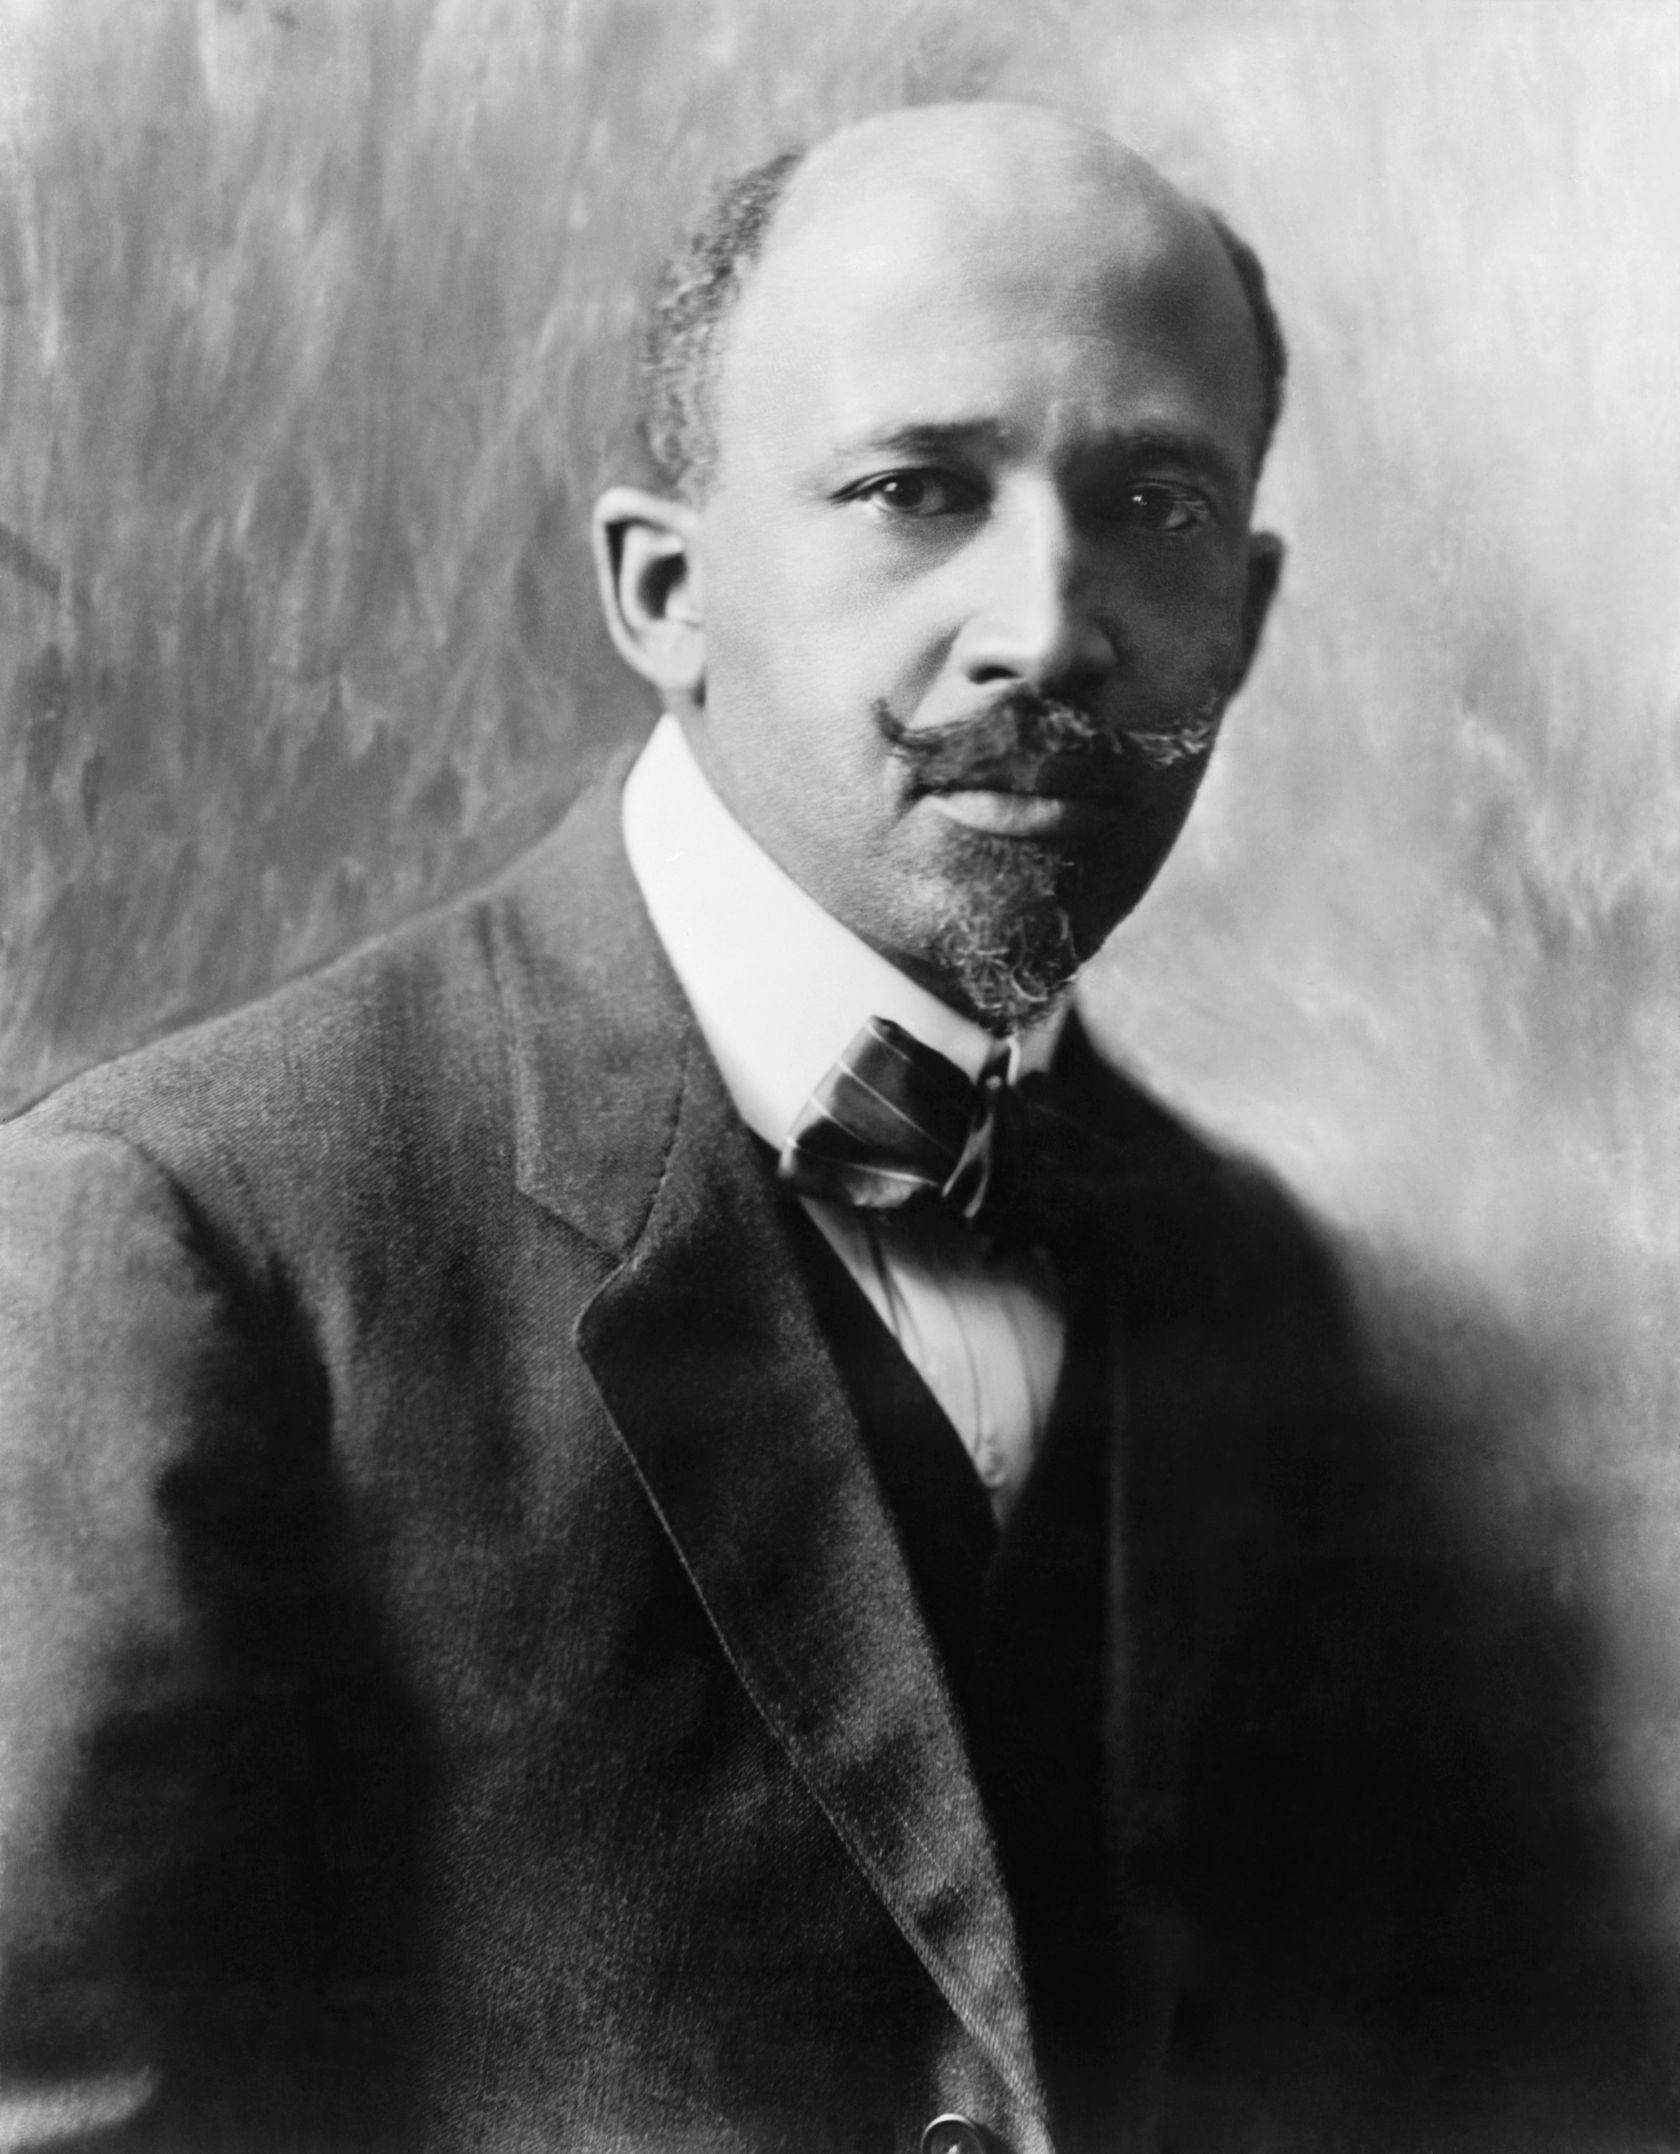 Portrait of W.E.B. DuBois